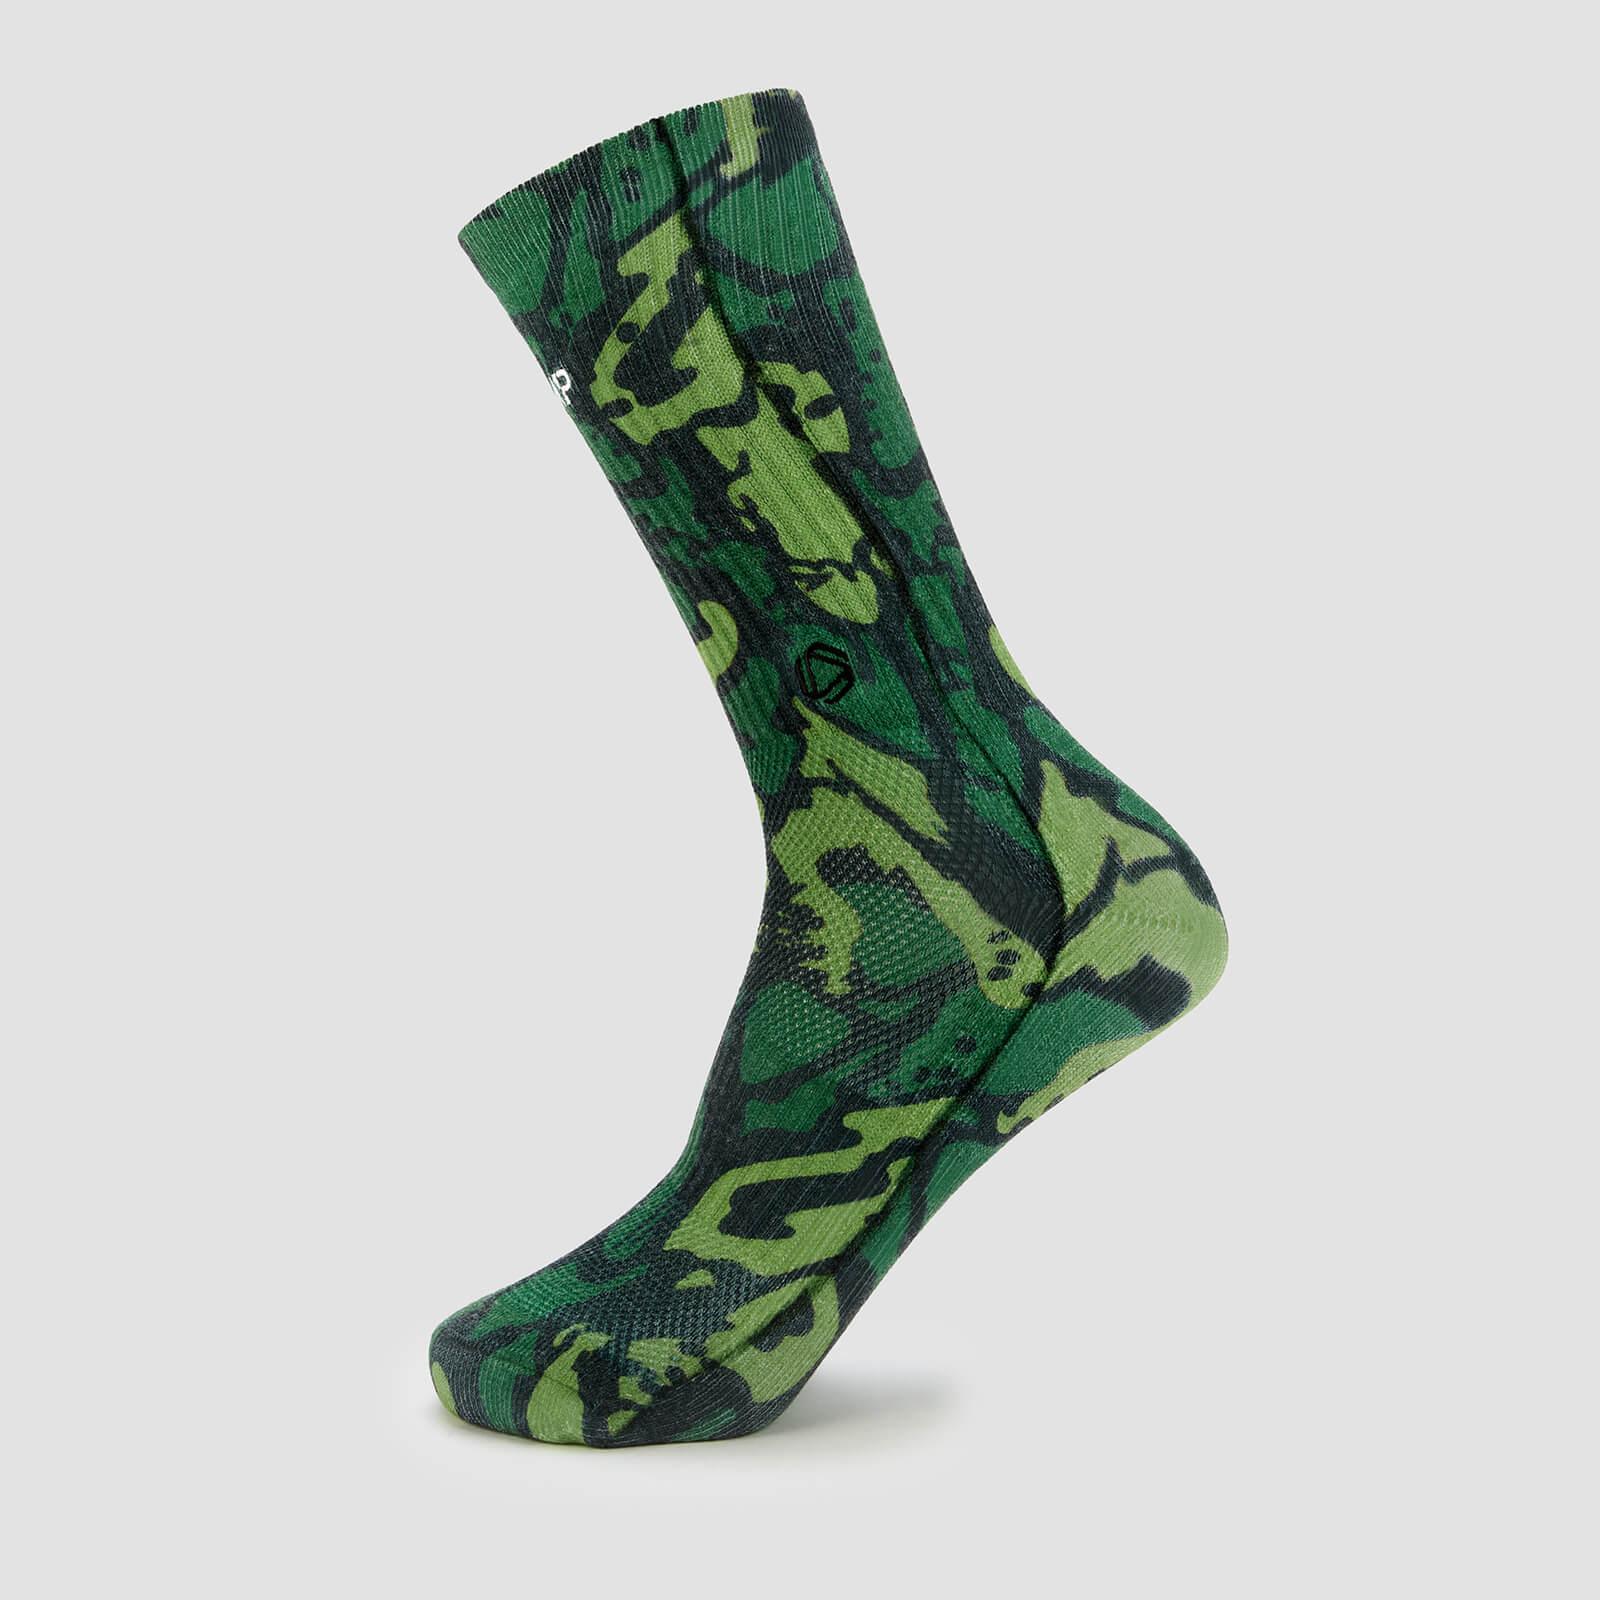 Купить Матросские носки MP x Hexxee Adapt - Mens UK 6-8.5, Myprotein International